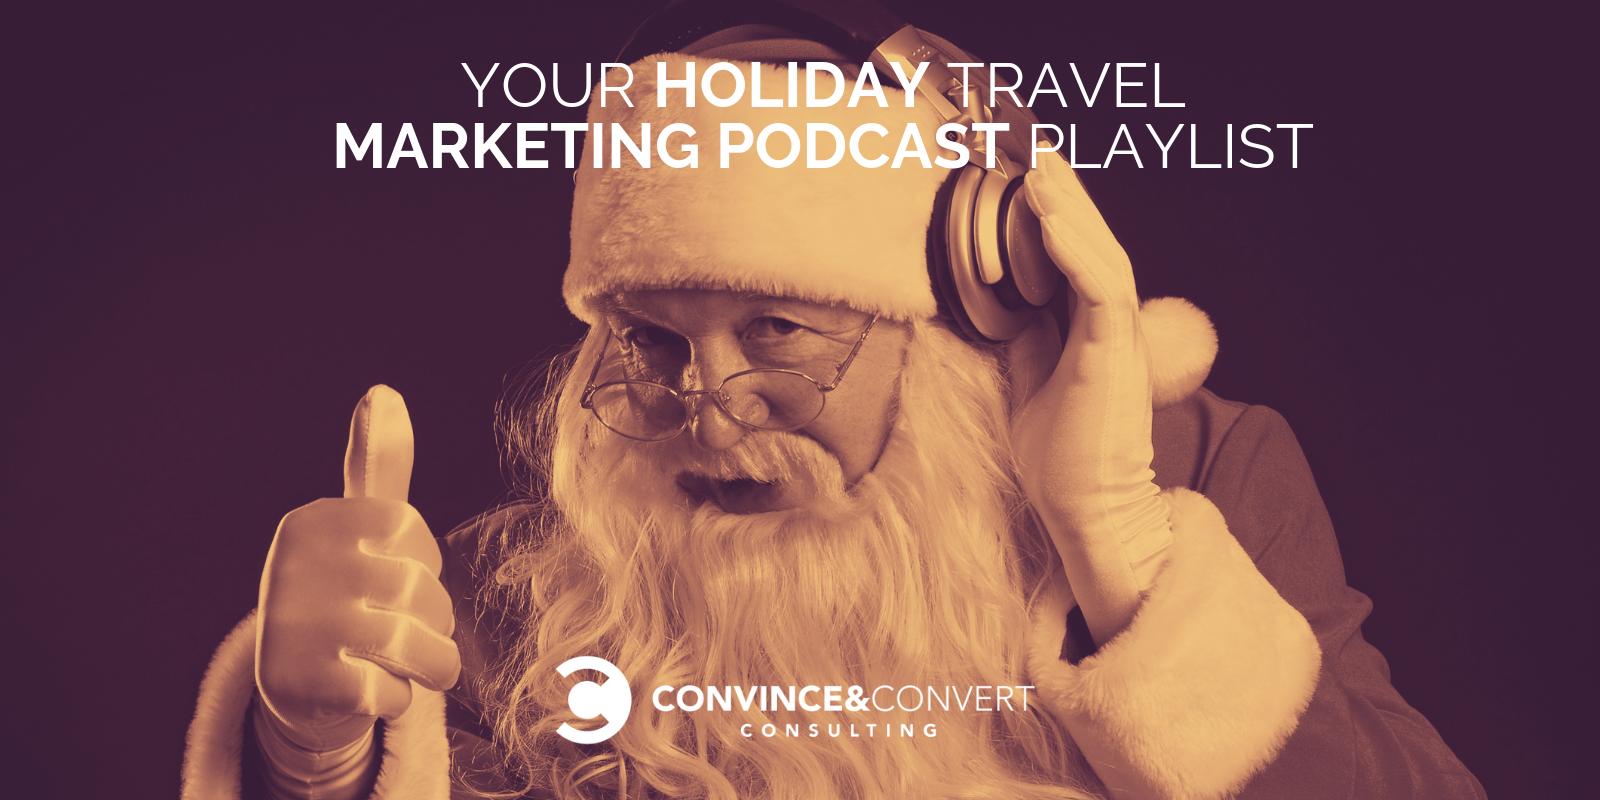 holiday travel marketing podcast playlist